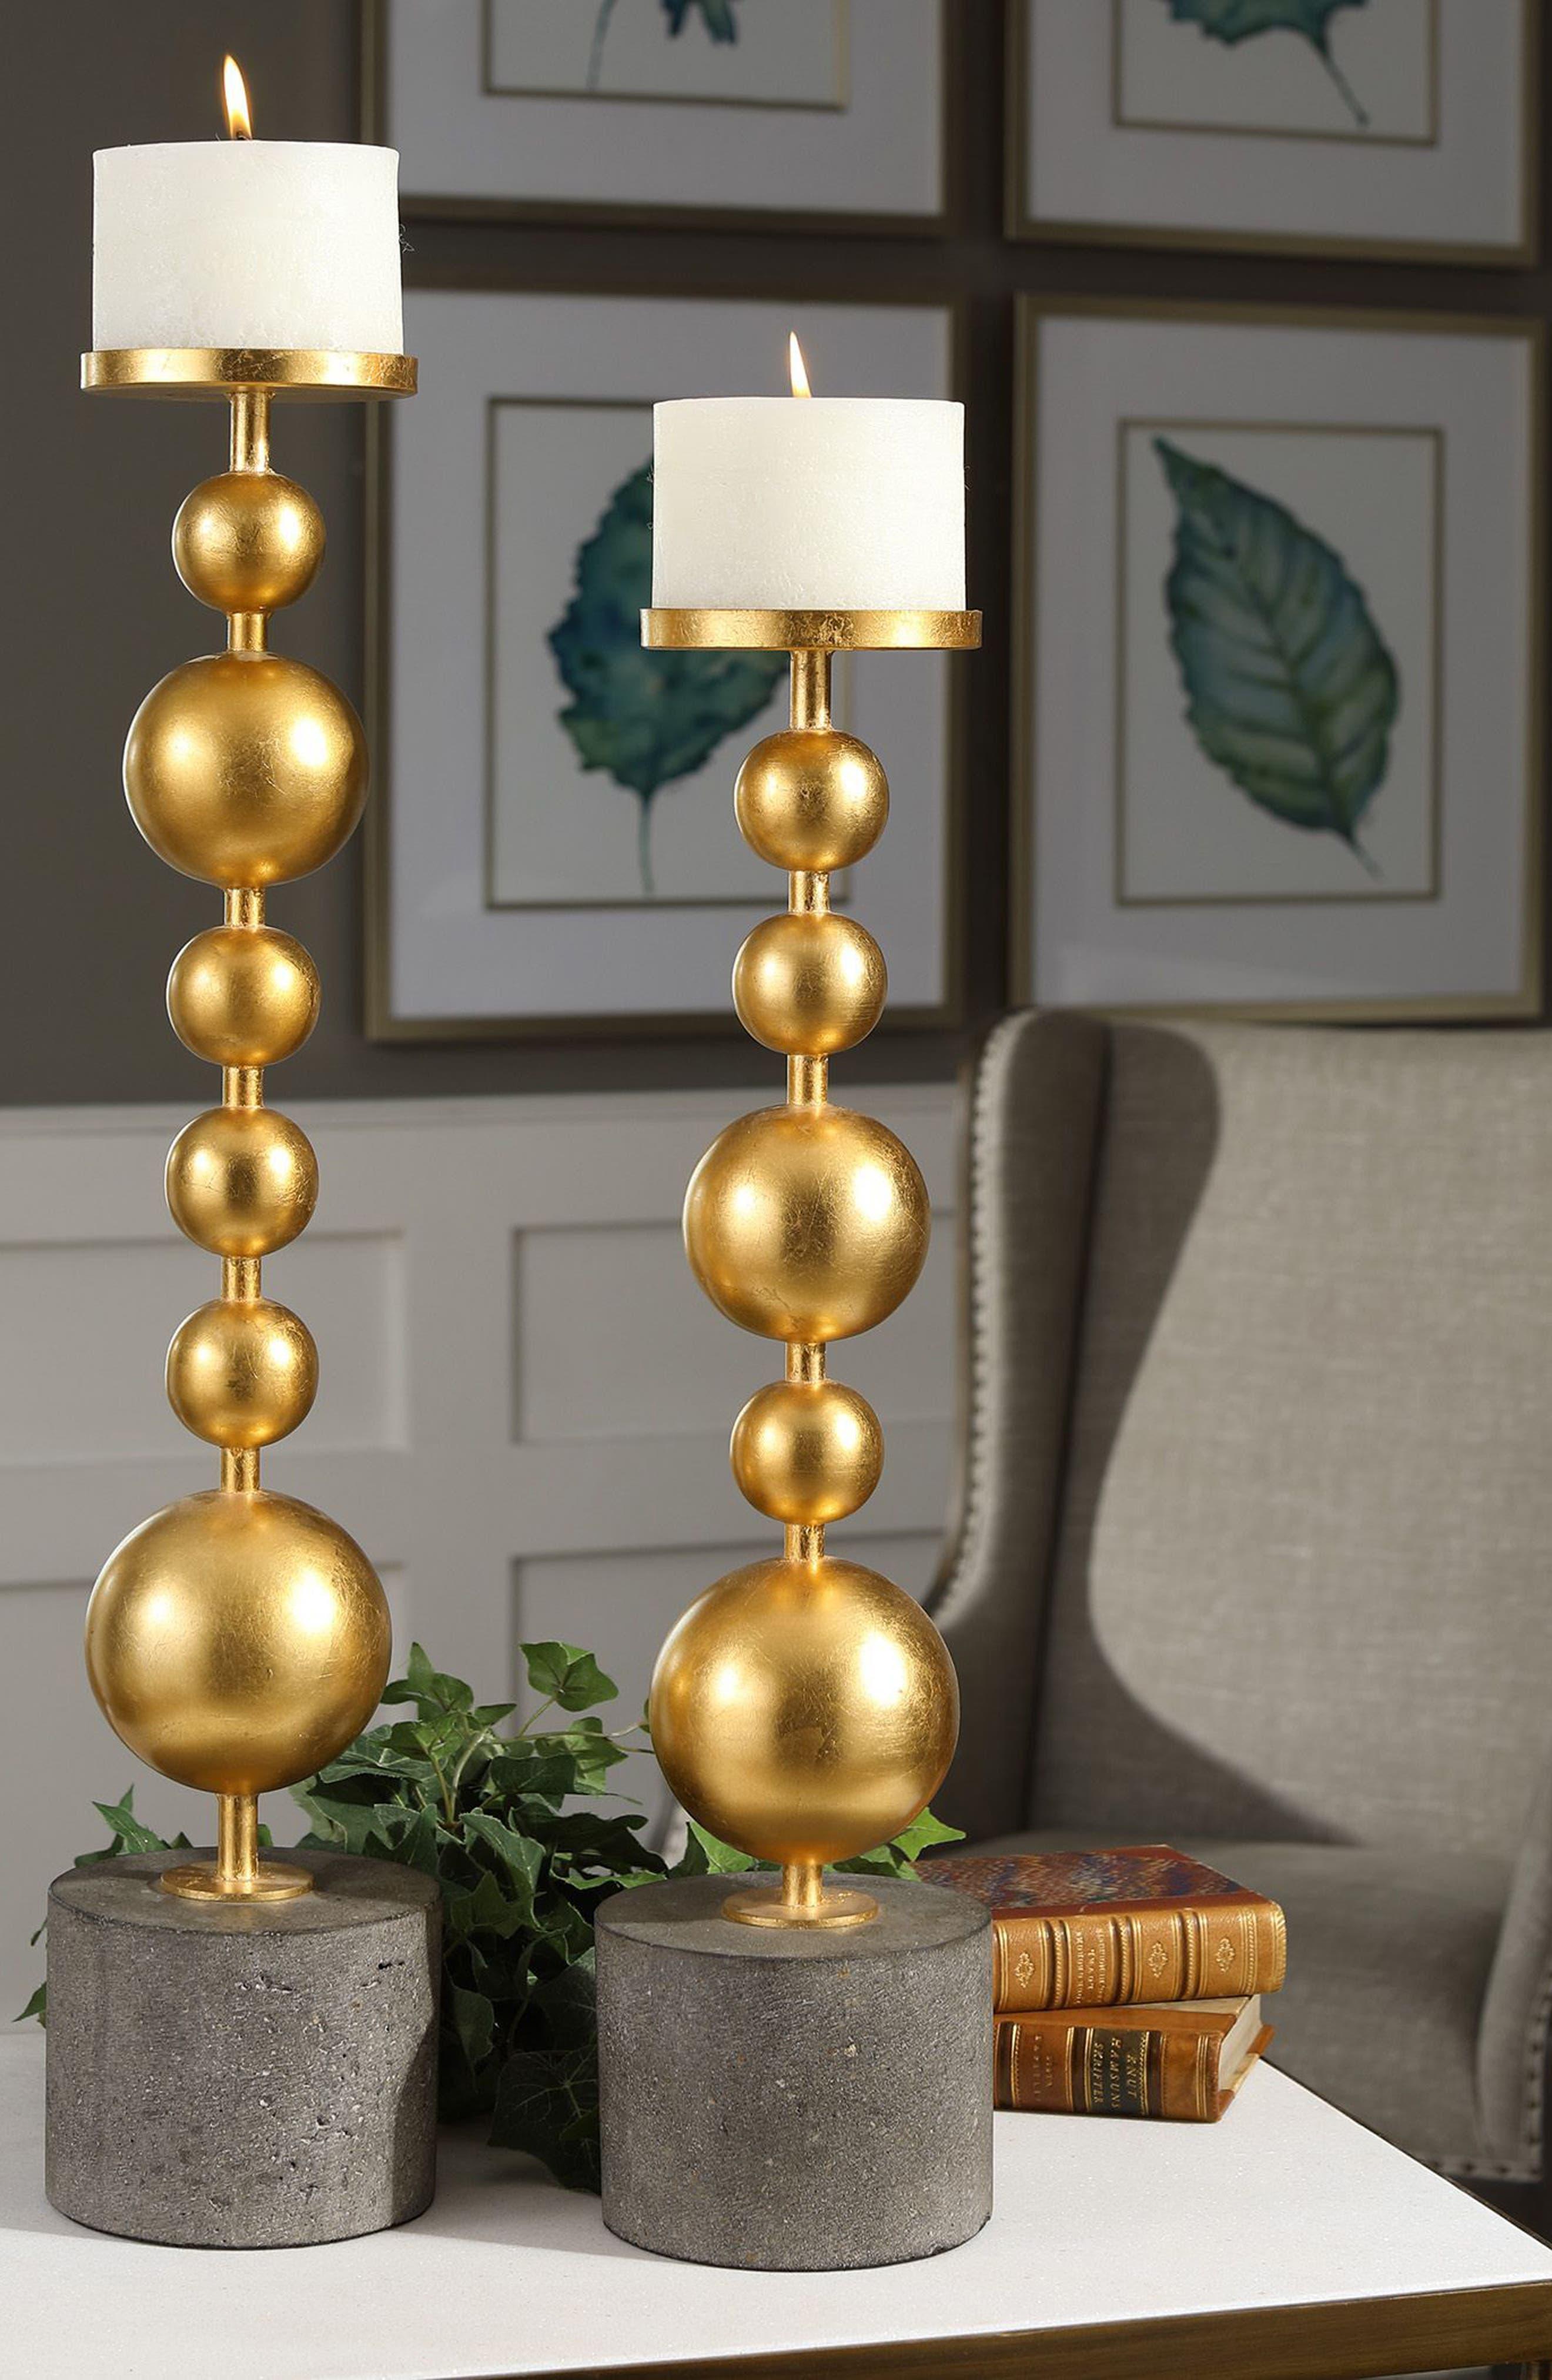 Selim Set of 2 Candleholders,                             Alternate thumbnail 2, color,                             Metallic Gold